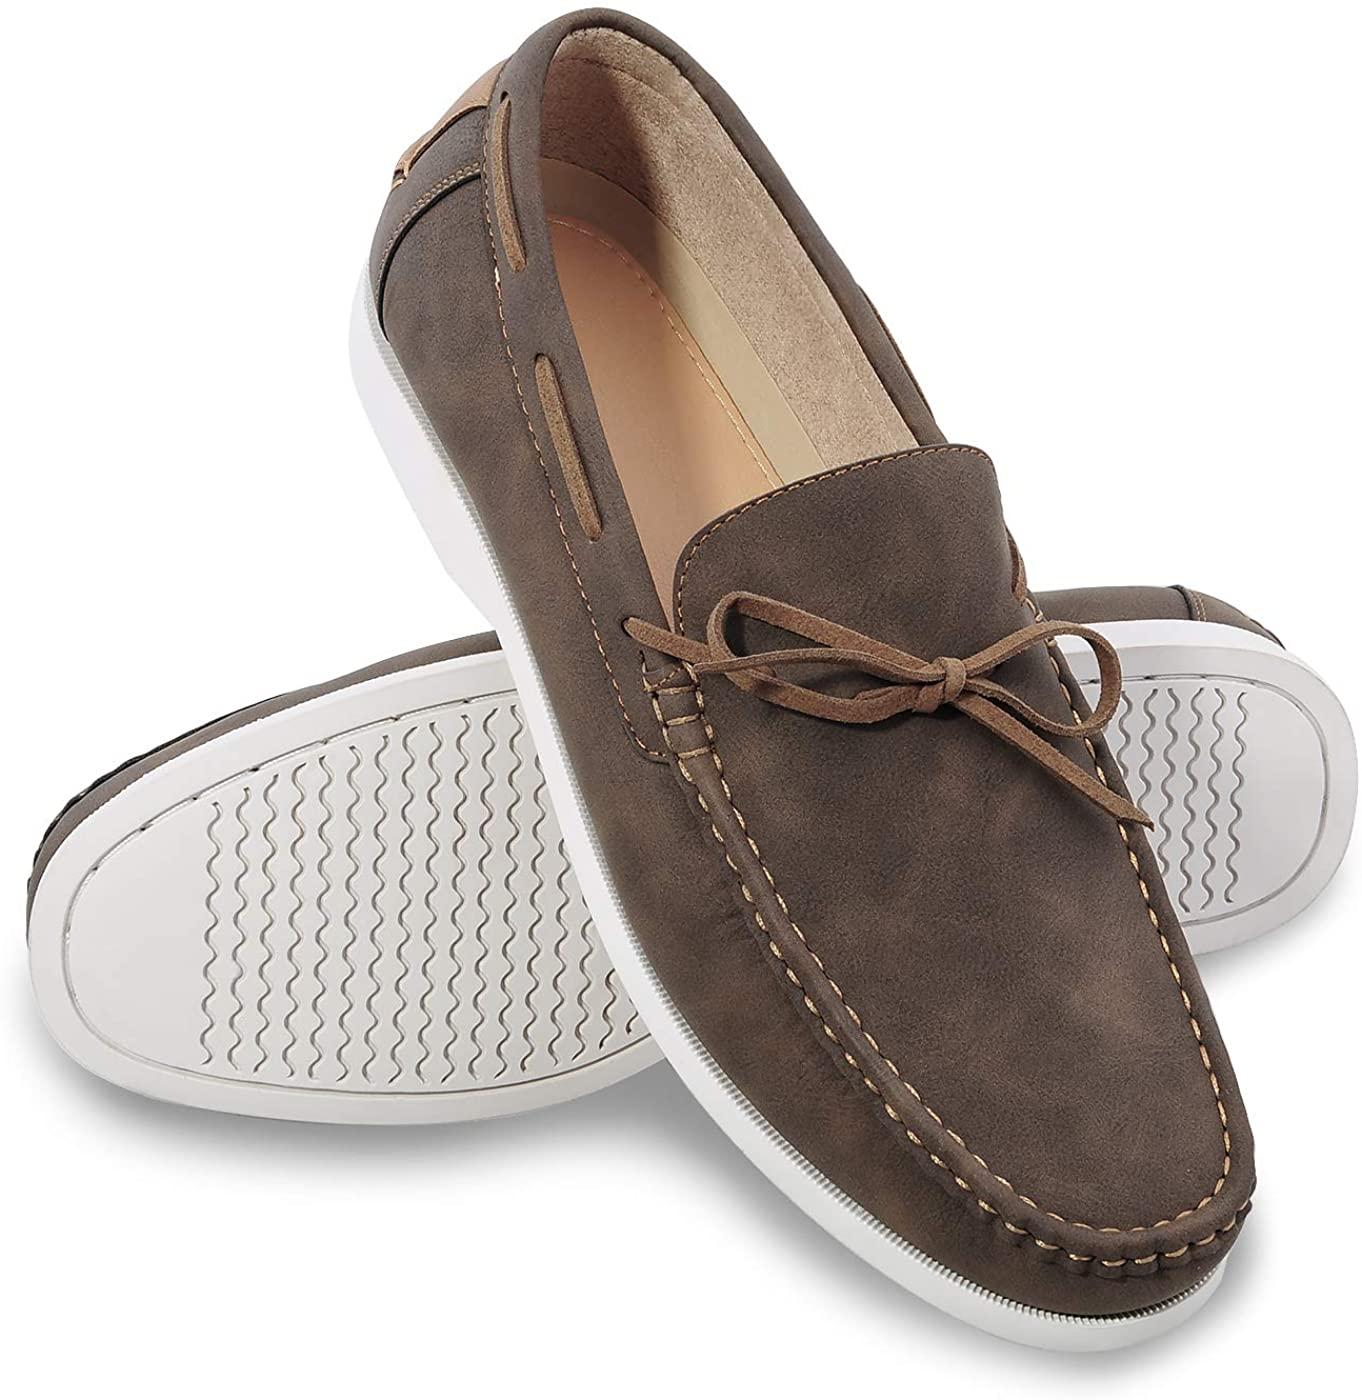 festooning Casual Loafers for Men, Men's Slip-on Shoes, Man Driving Walking Work Flats Indoors Outdoors Summer